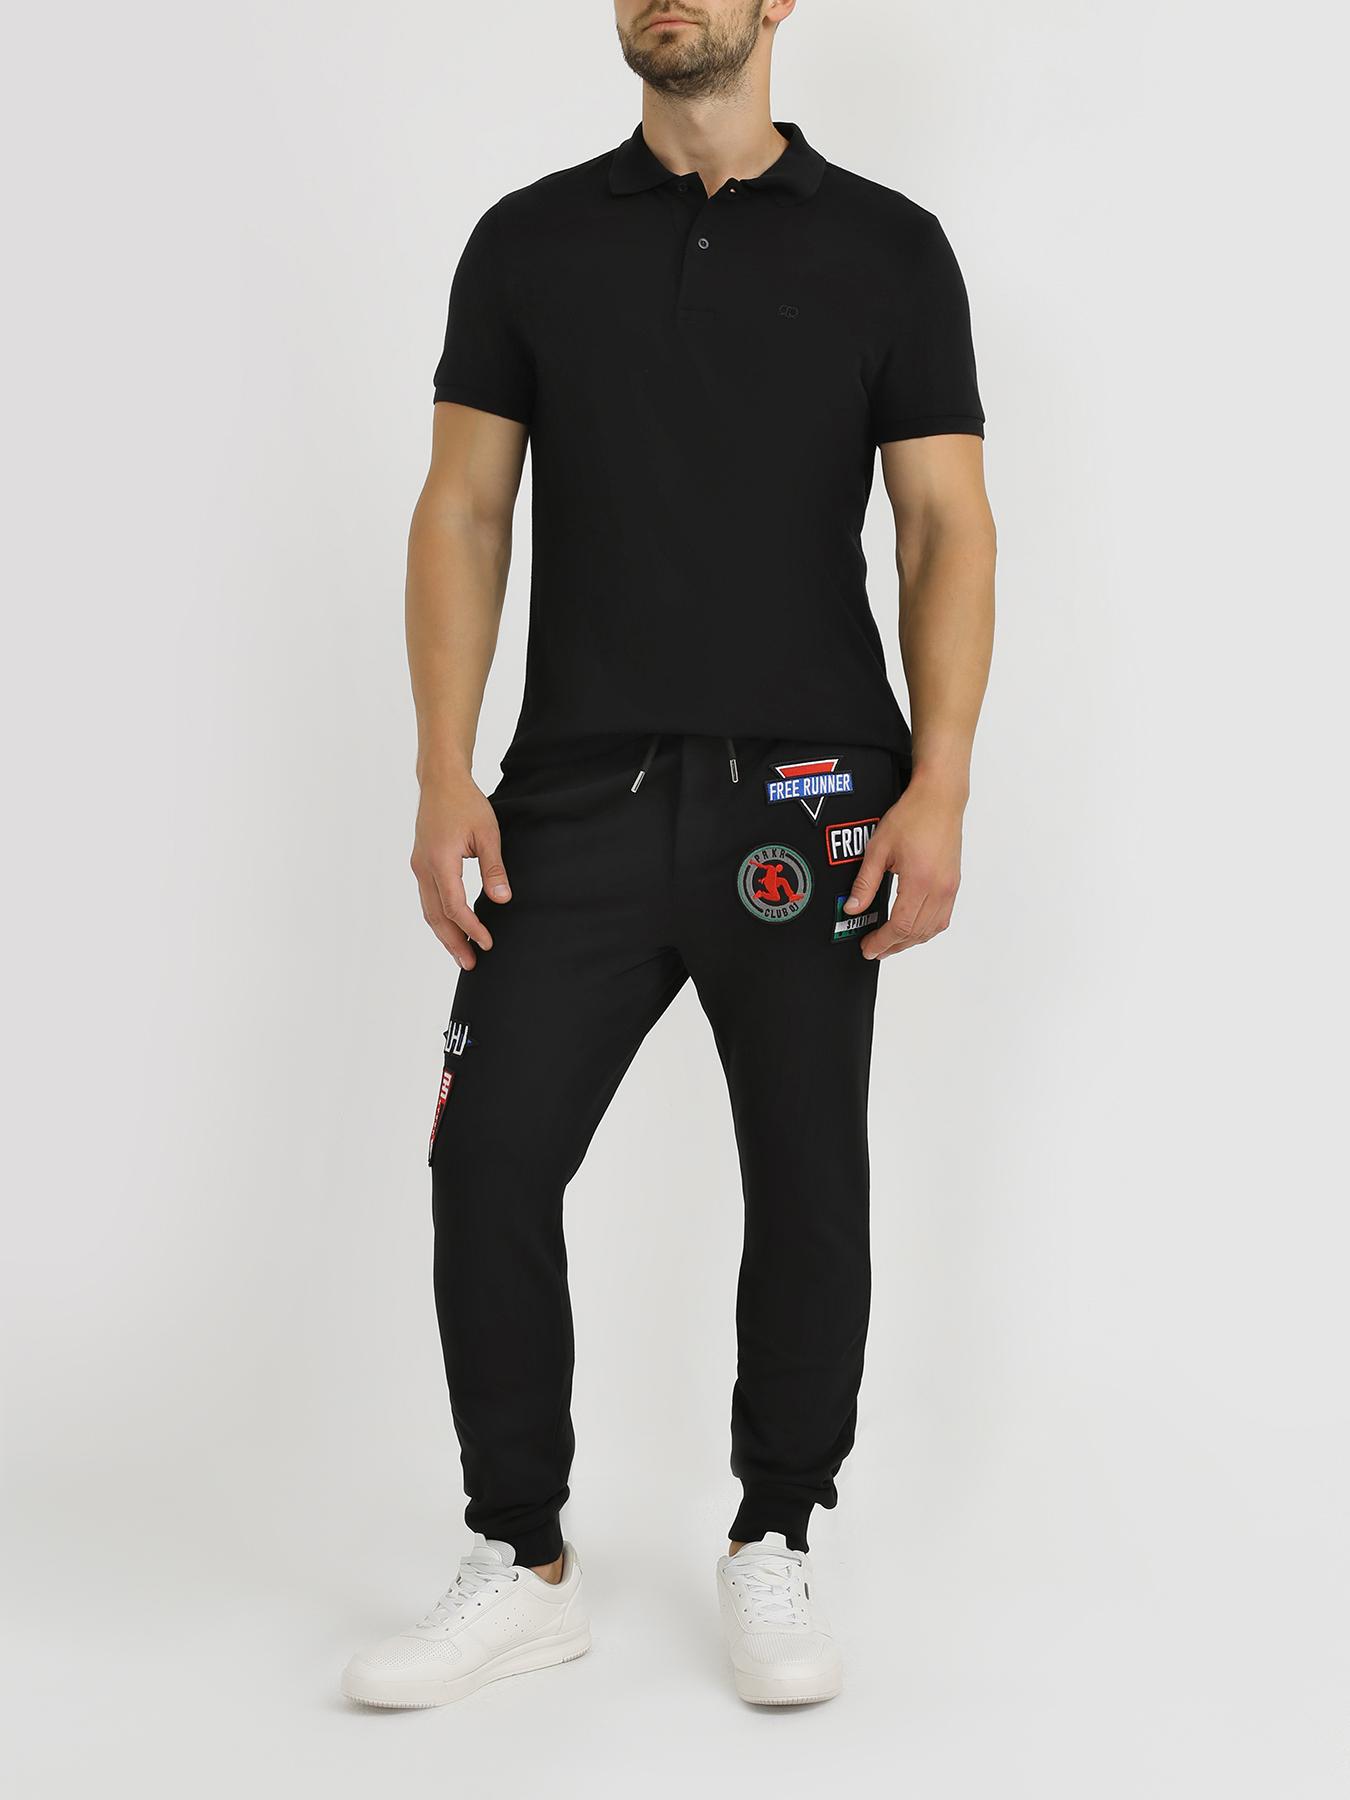 Les hommes urban Спортивные брюки фото